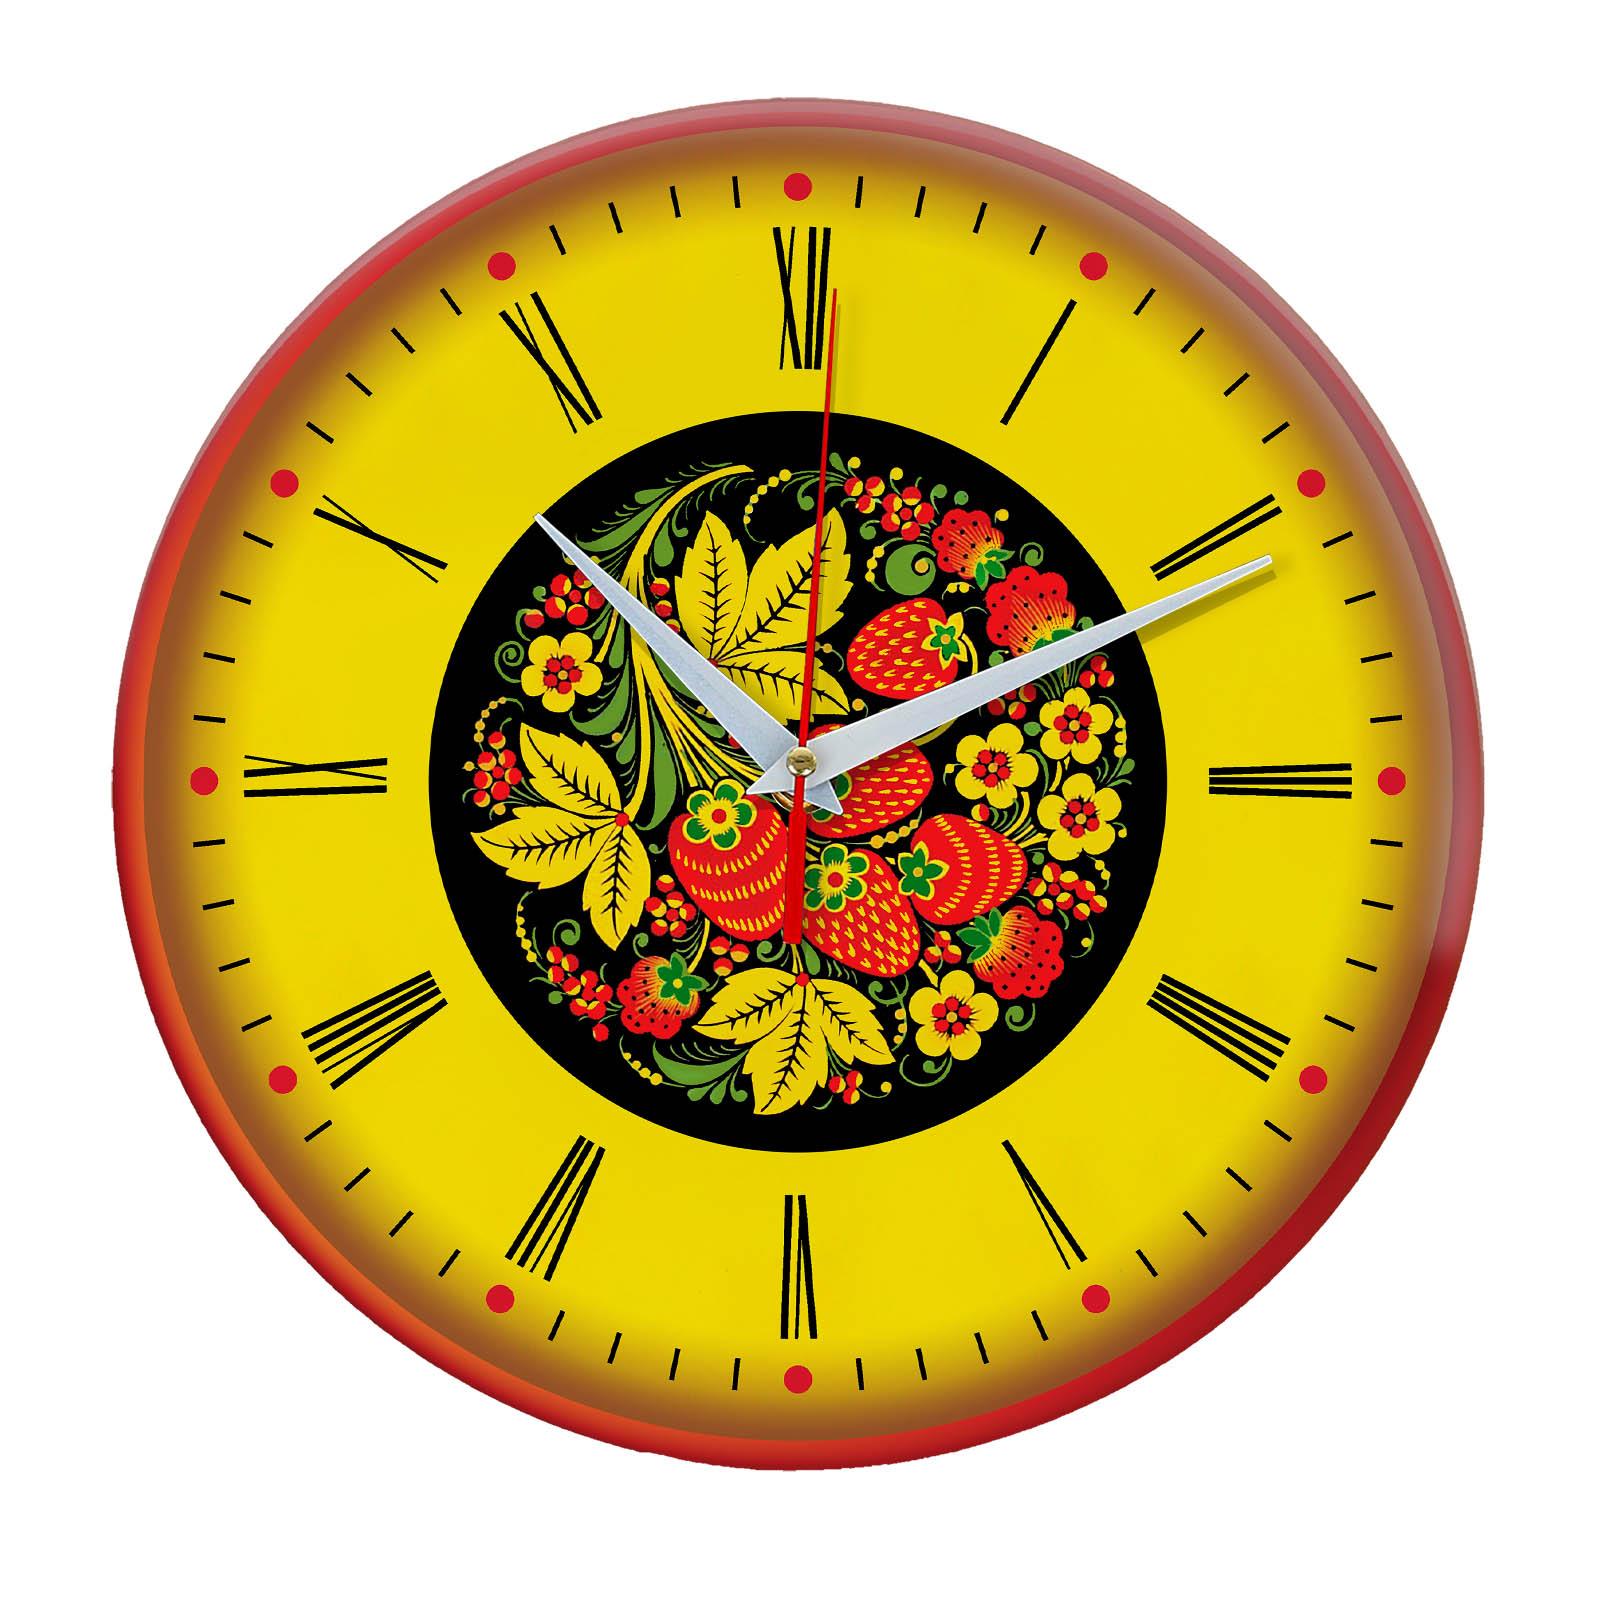 Народные промыслы часы Хохлома 1